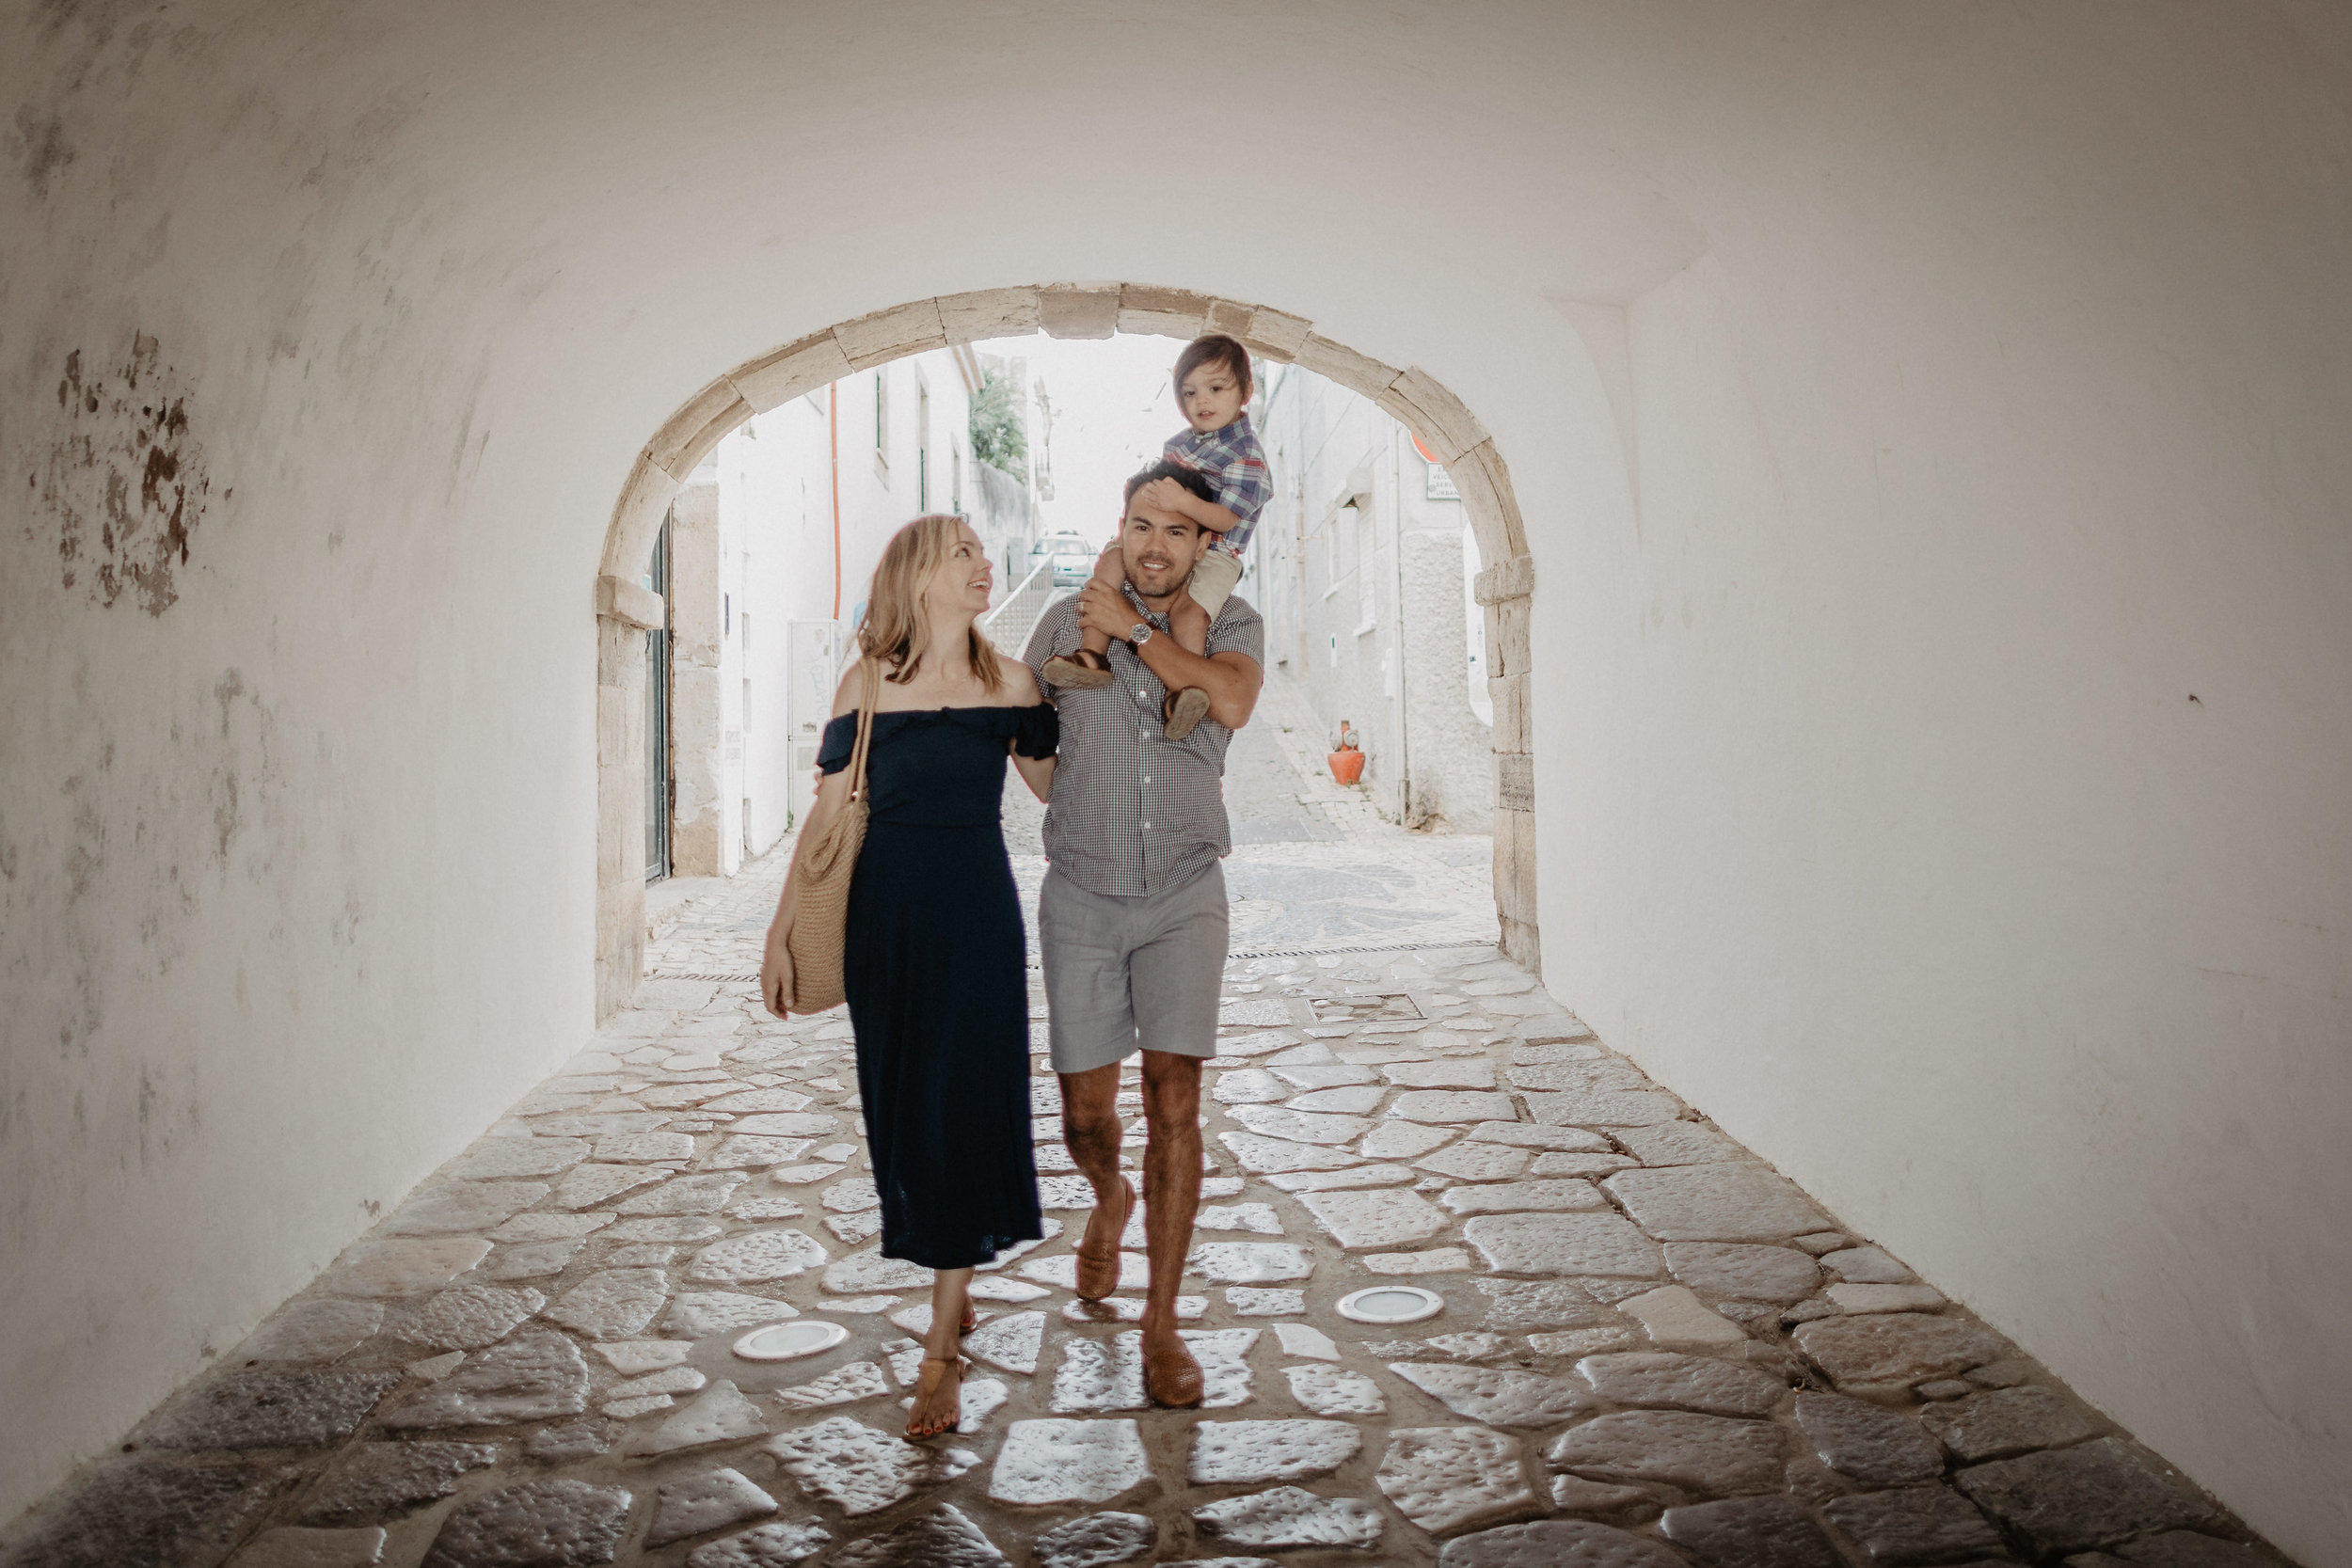 Lapela-Family-photography-Lagos-Algarve19.jpg